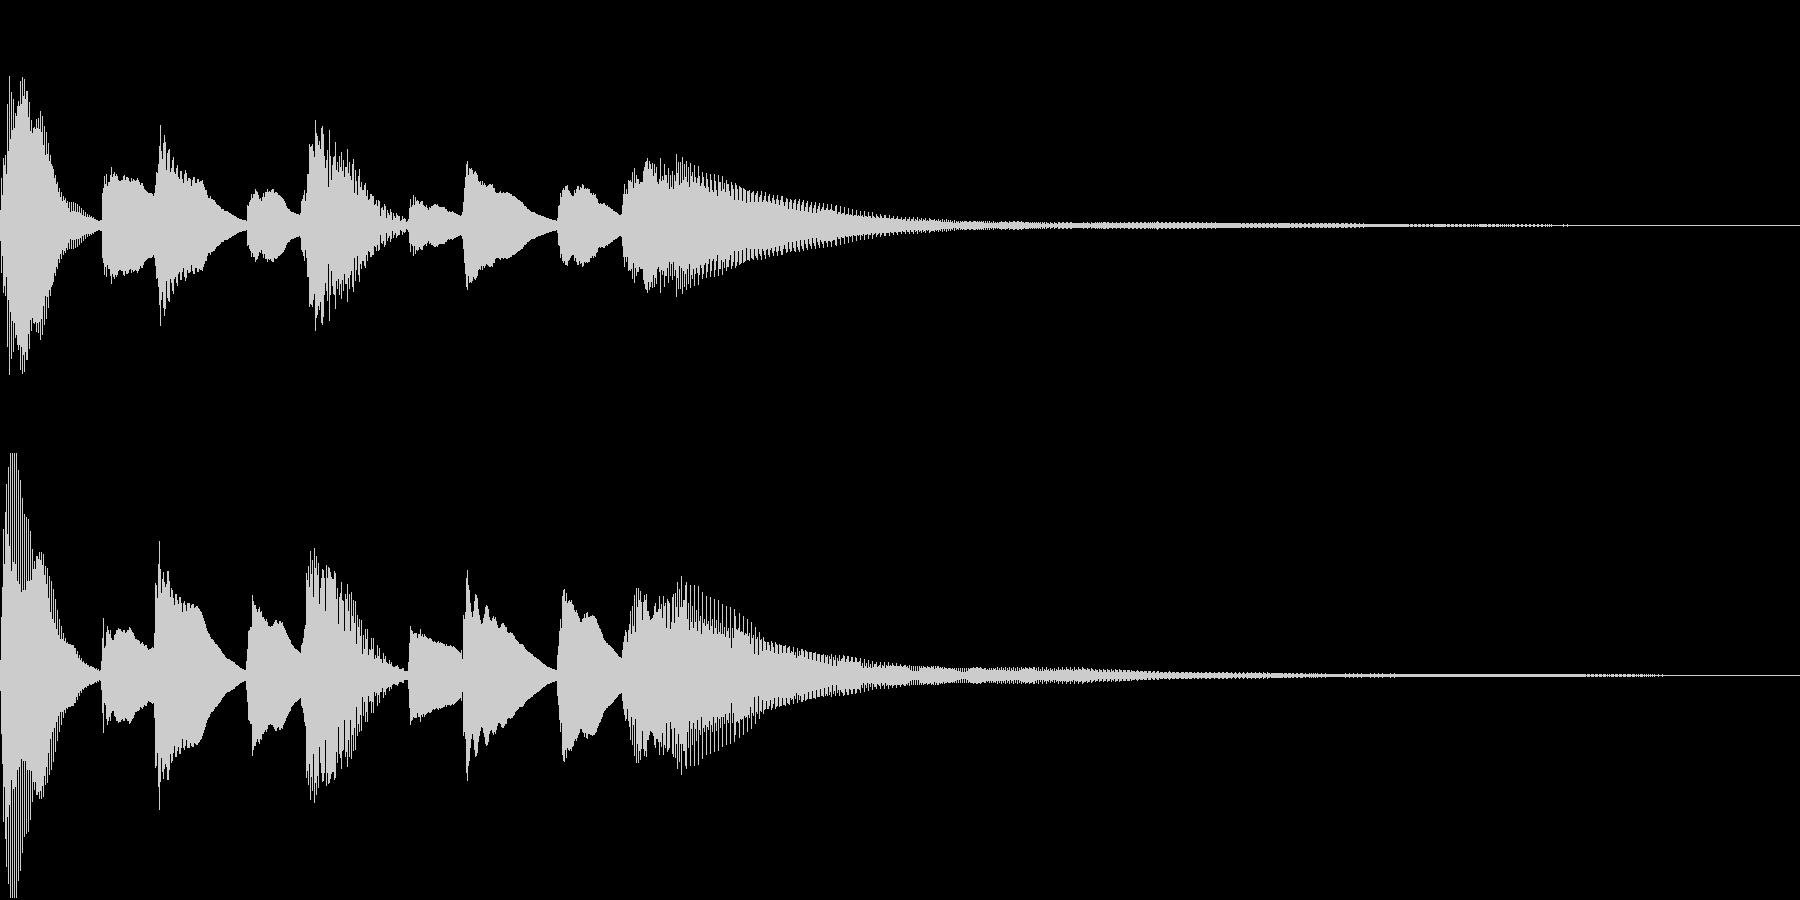 Gentle piano opening jingle's unreproduced waveform